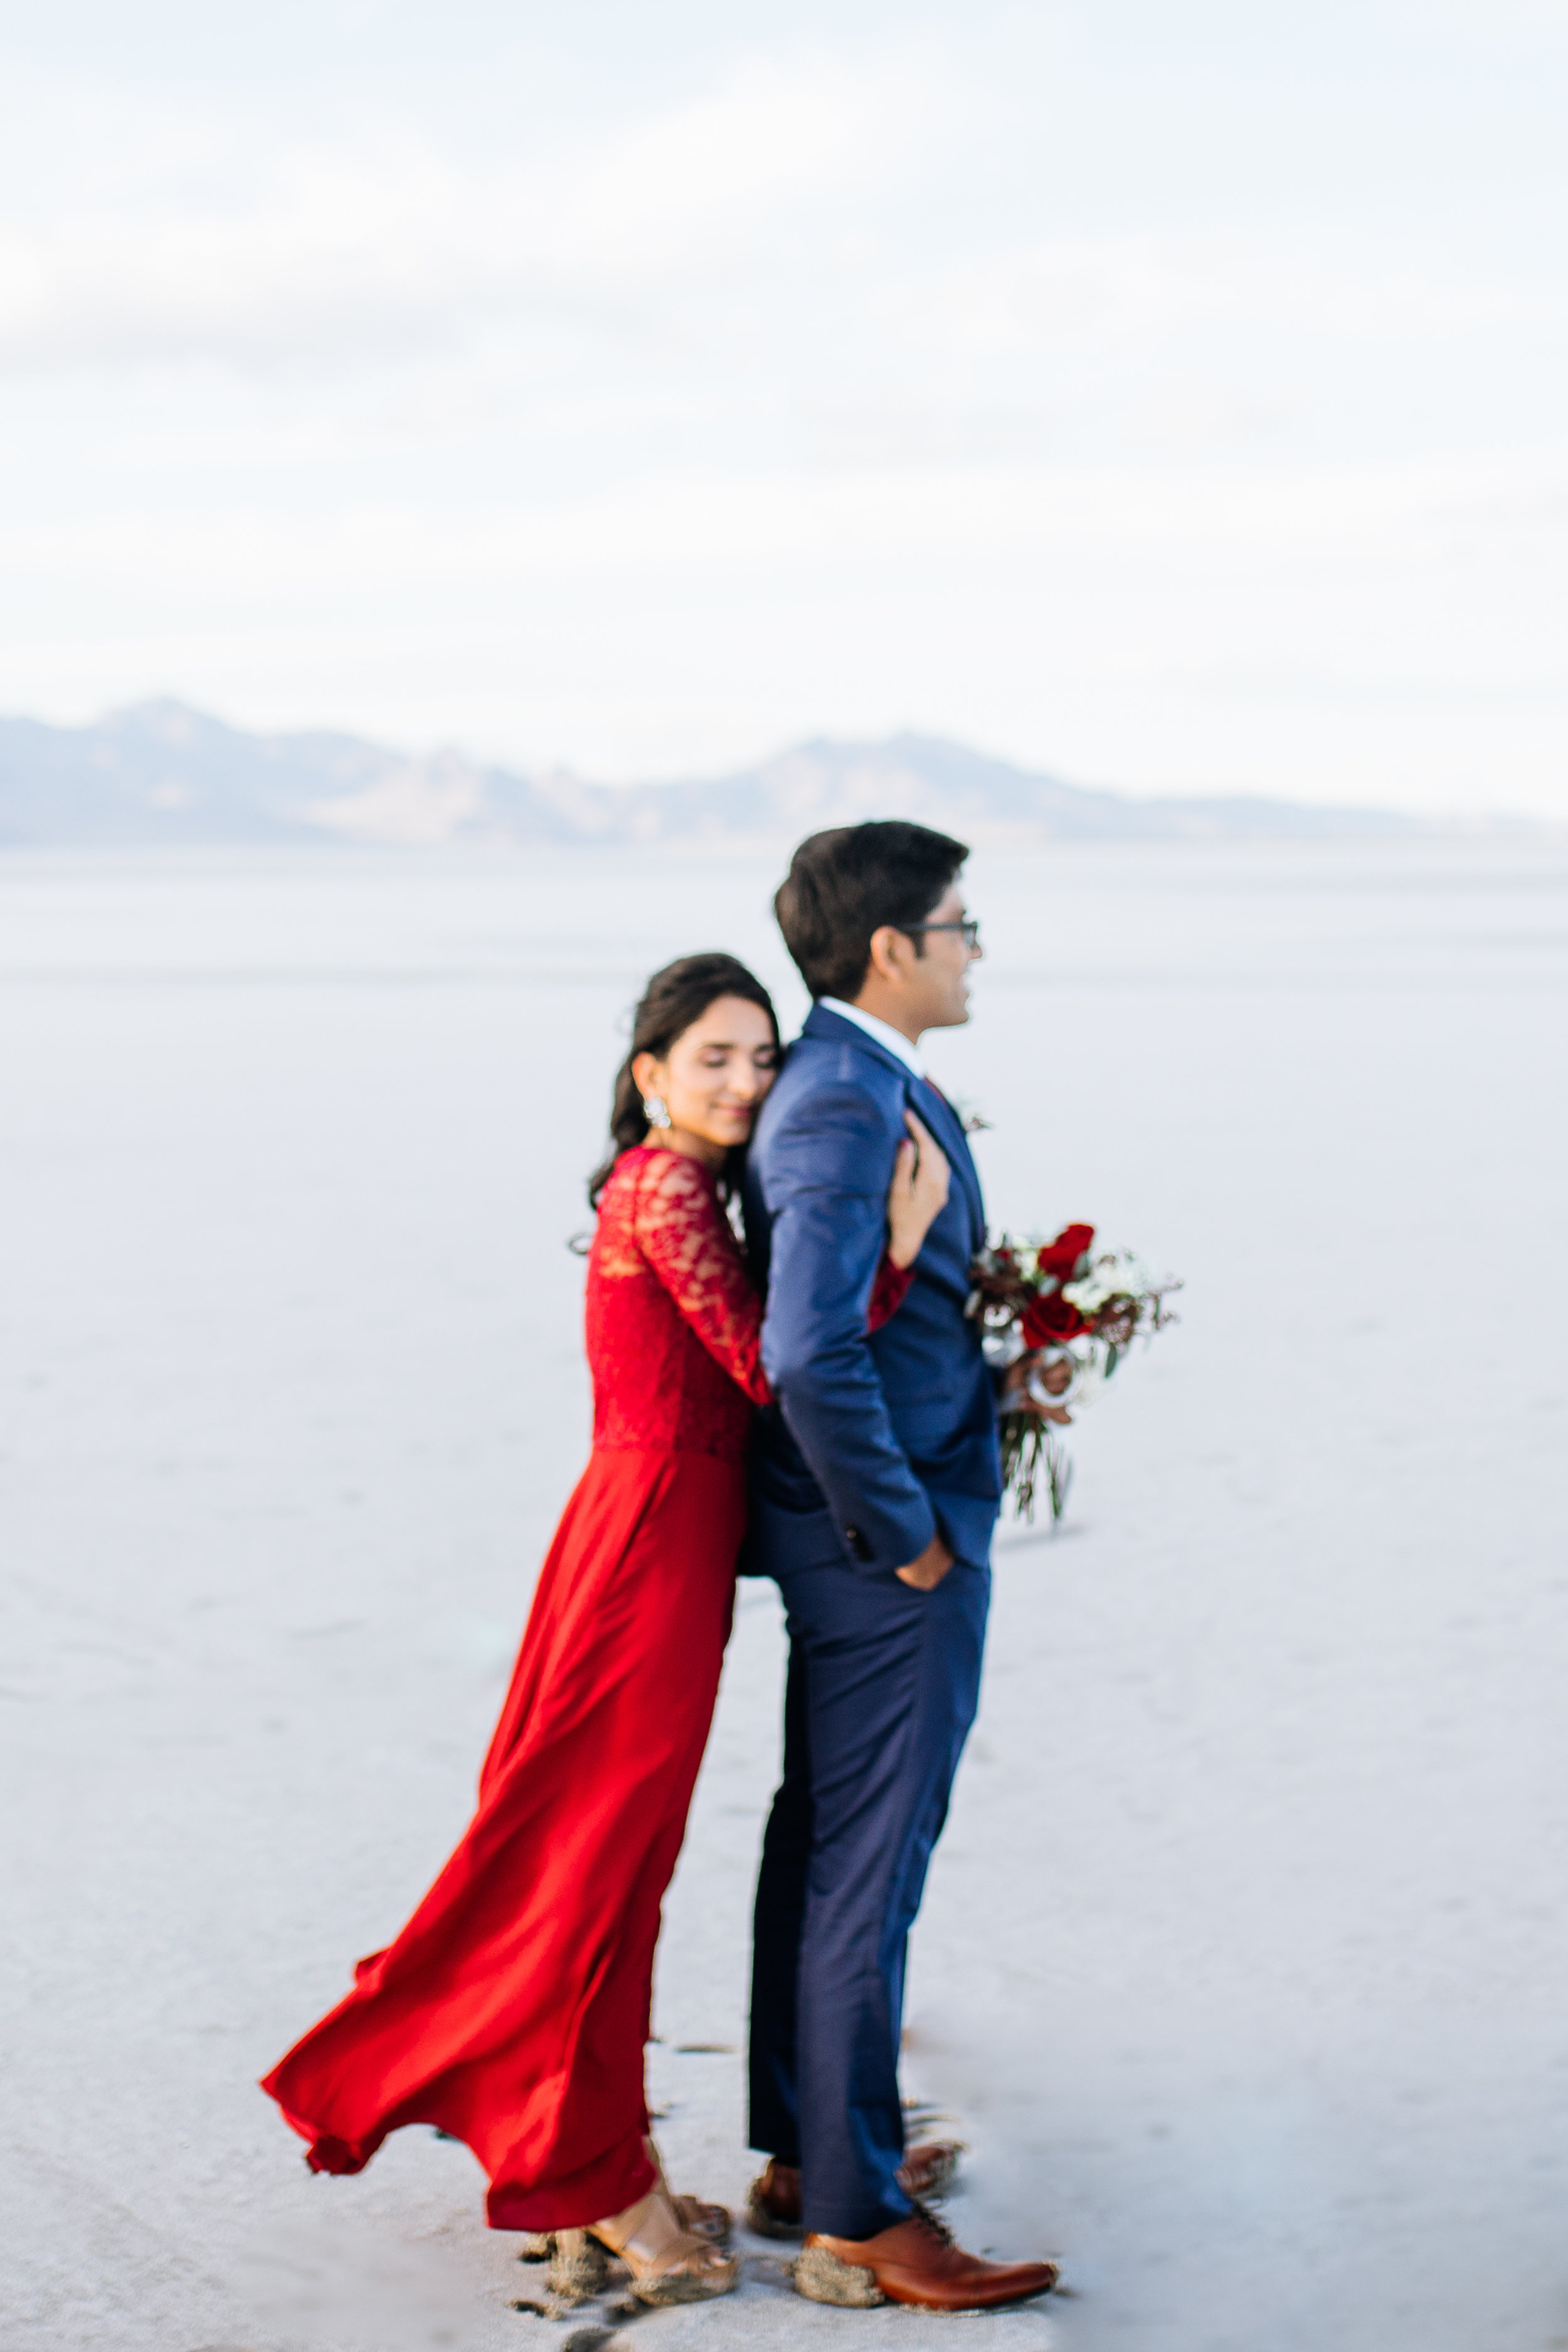 bonneville-salt-flats-engagement-couple-photos-destination-wedding-photography-5.jpg